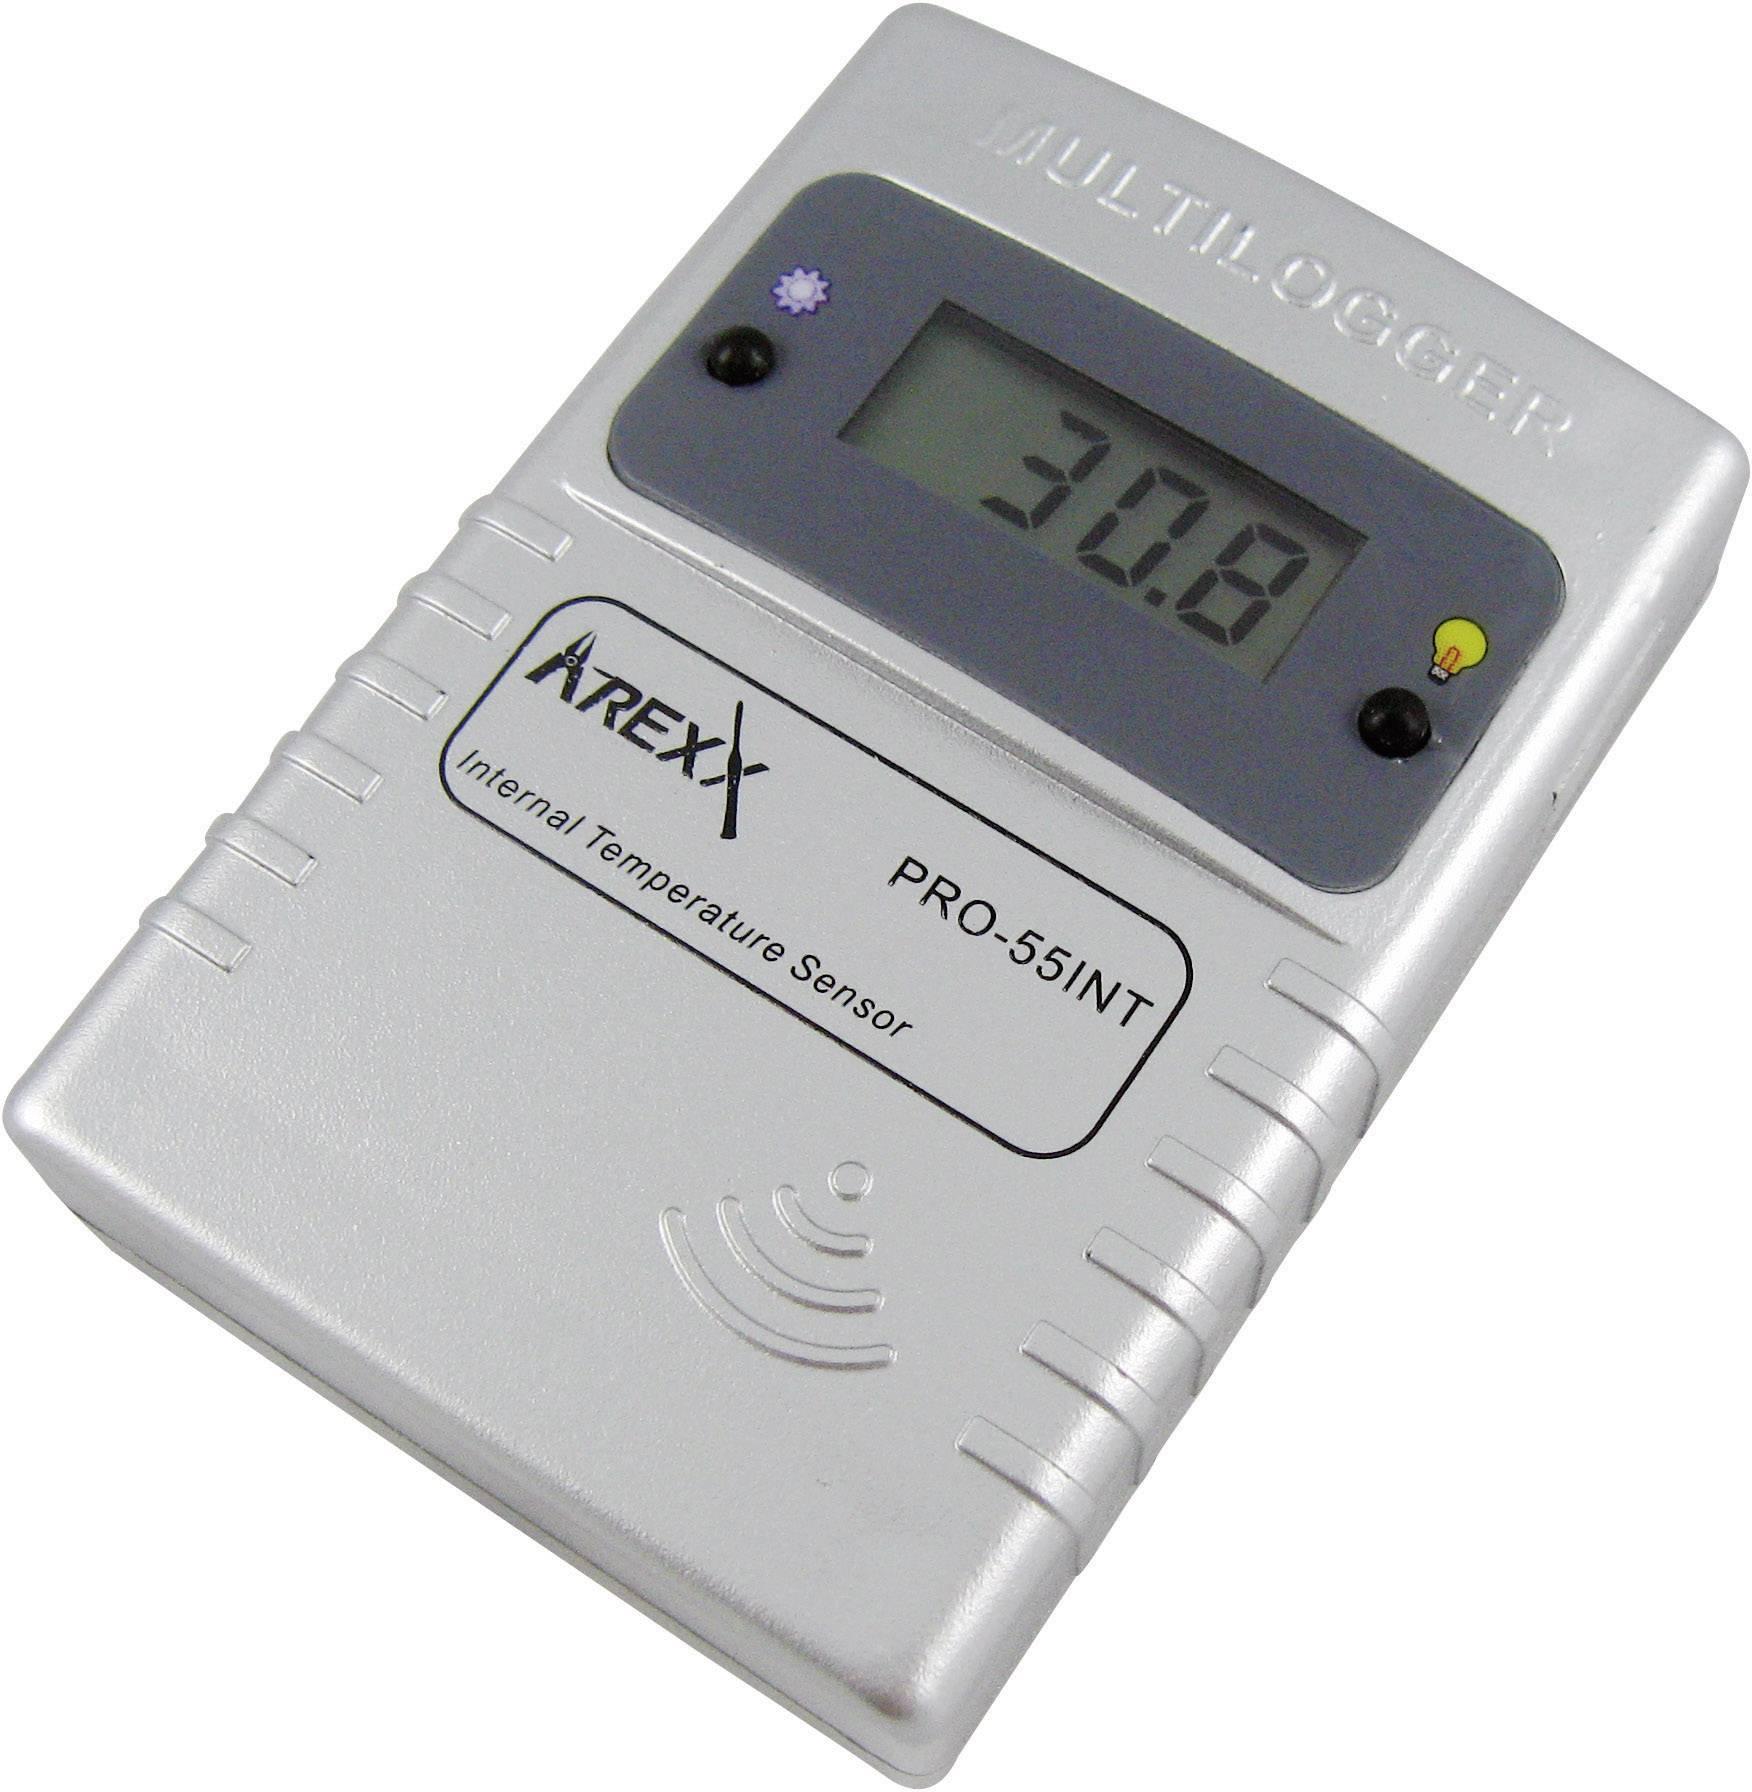 Teplotný datalogger Arexx PRO-55int, -55 až +125 °C